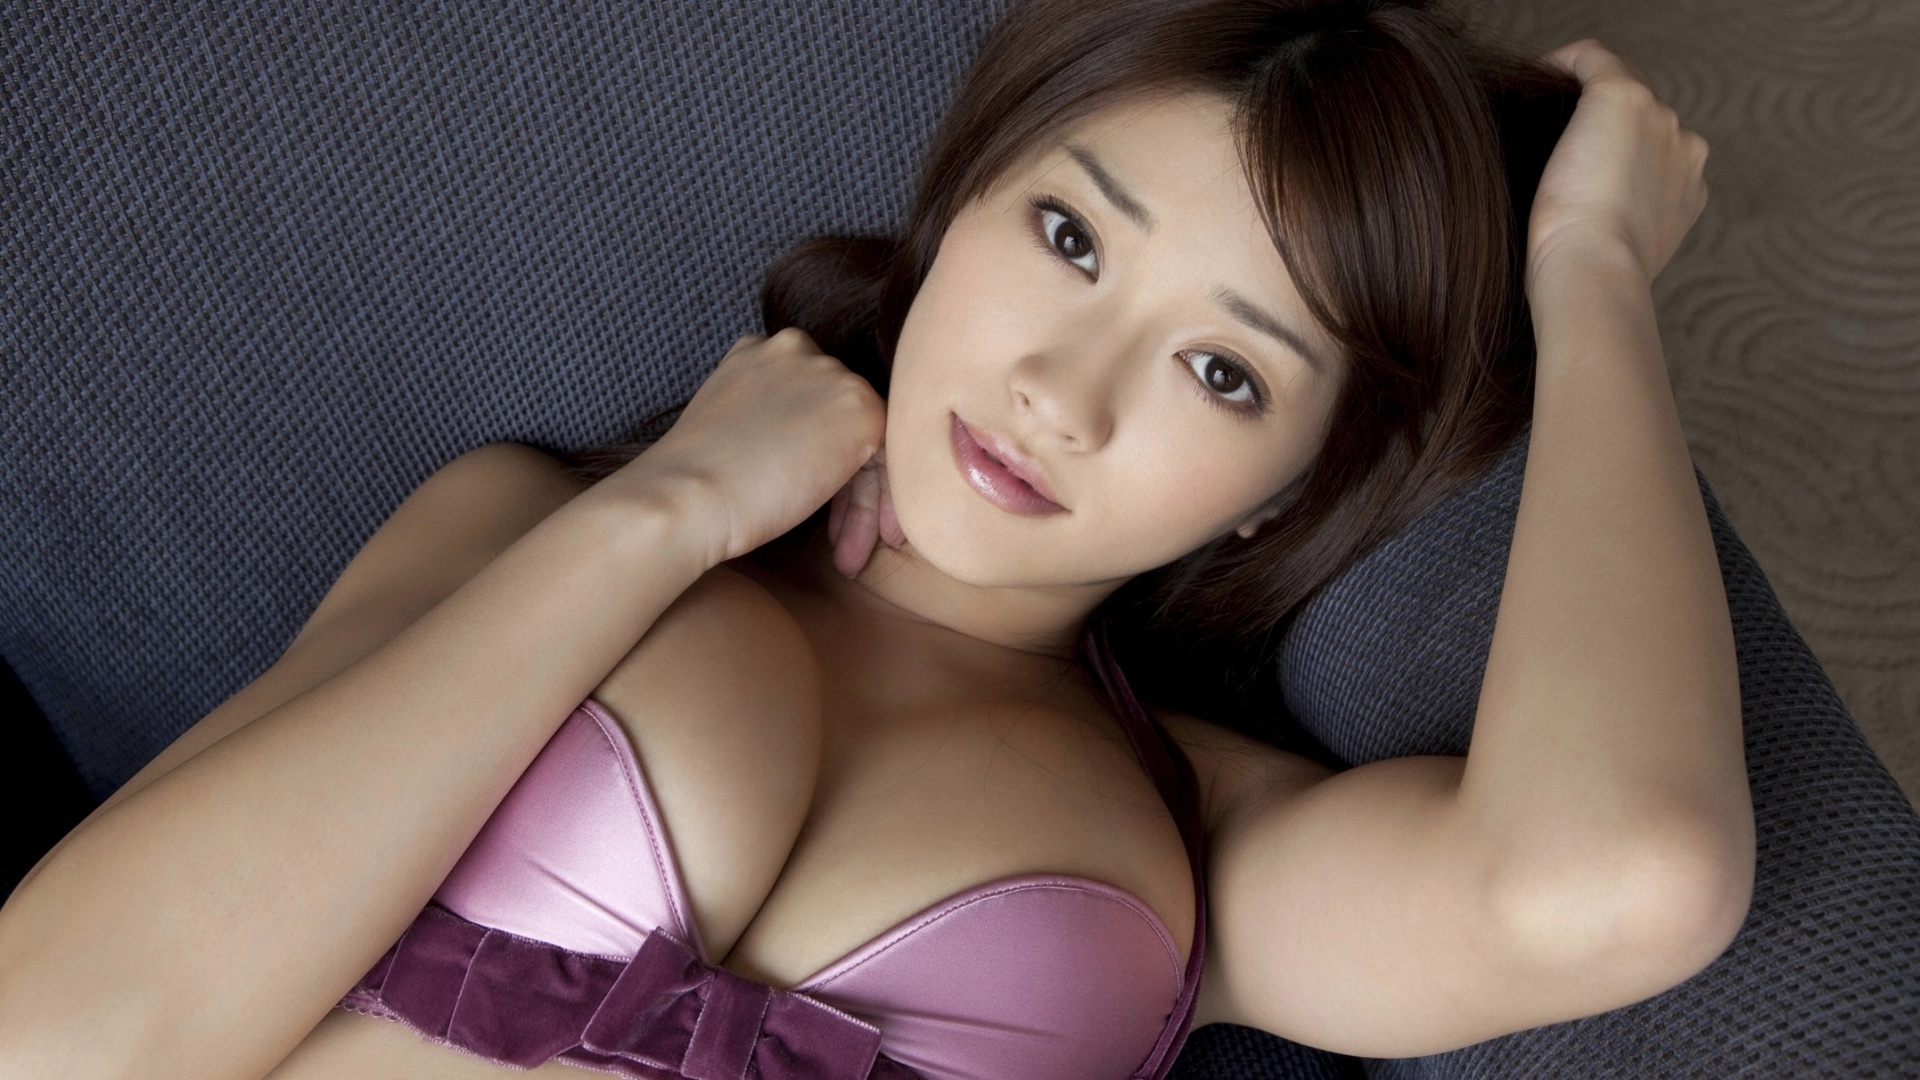 Секс с красивыми девочками фото, Секси девушки (69 фото) 11 фотография